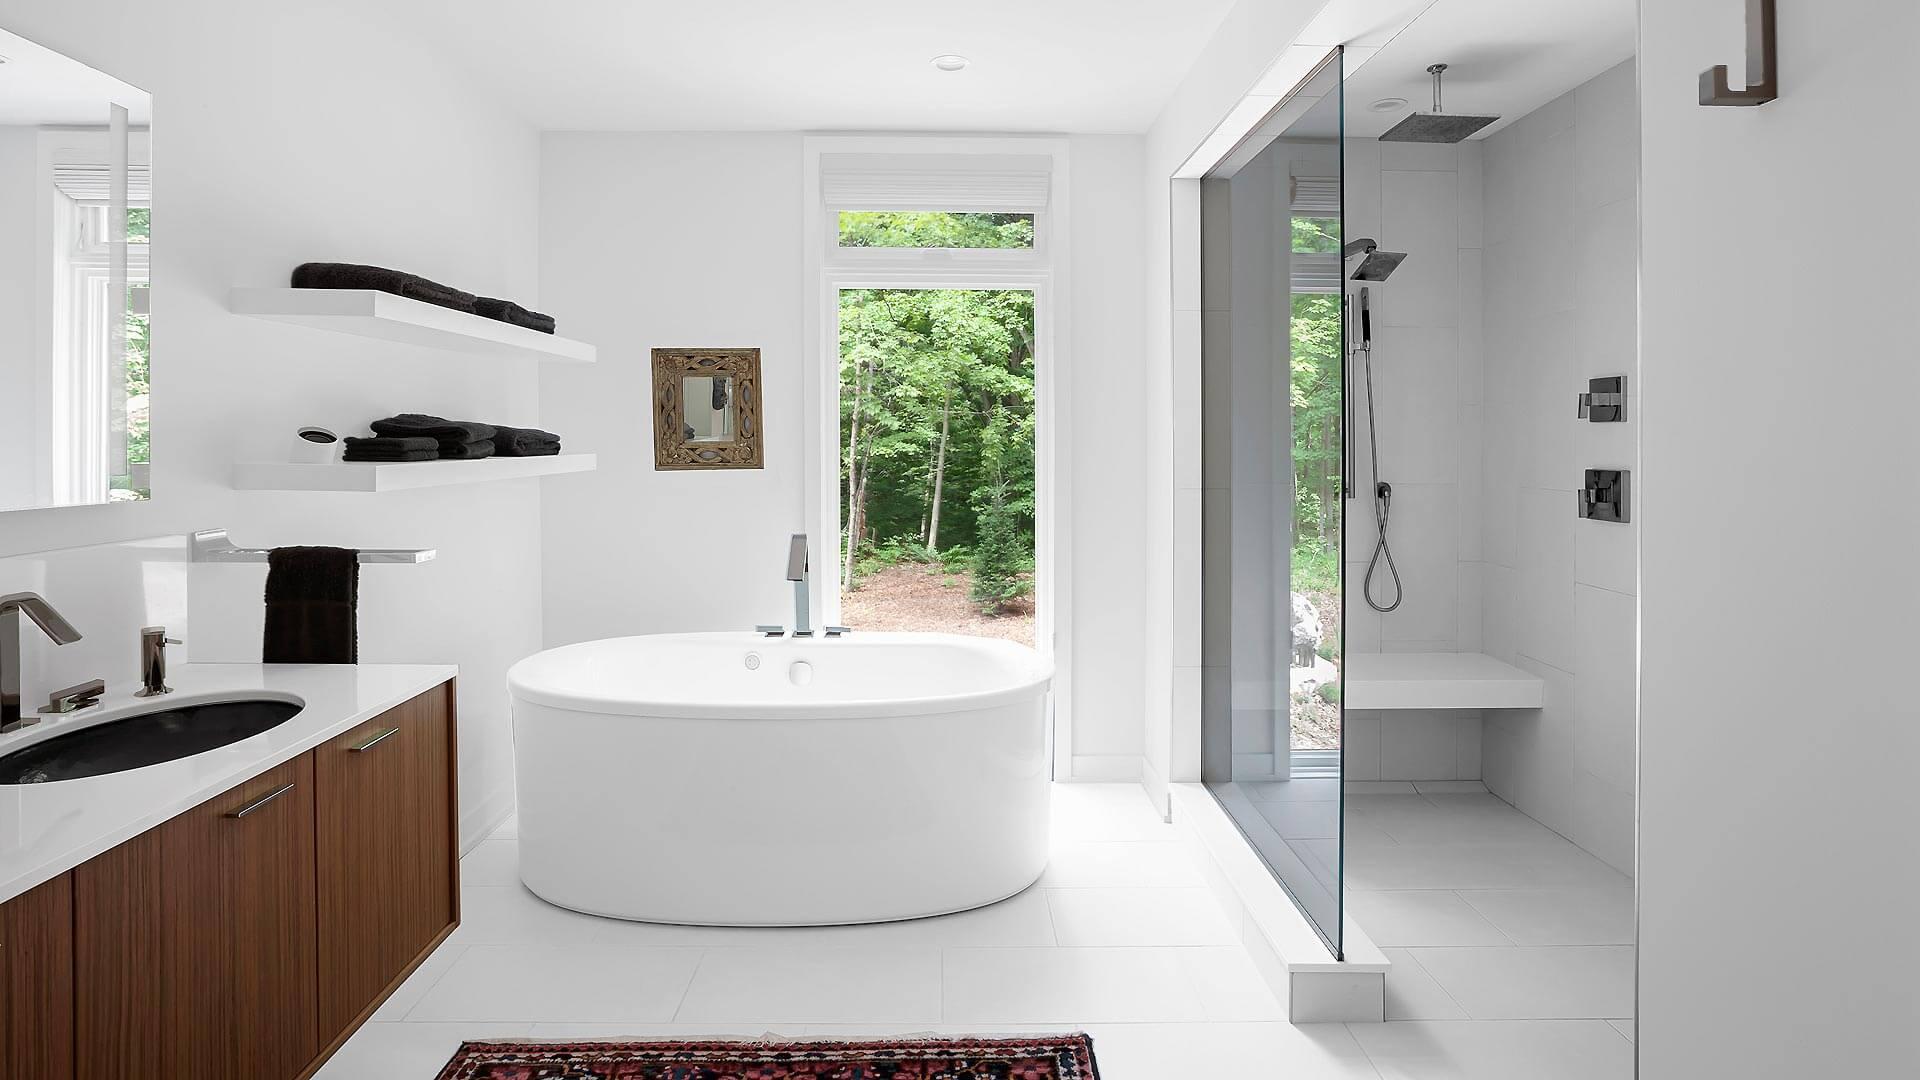 Master Spa Bathroom - Bridge House - Fenneville, Michigan - Lake Michigan